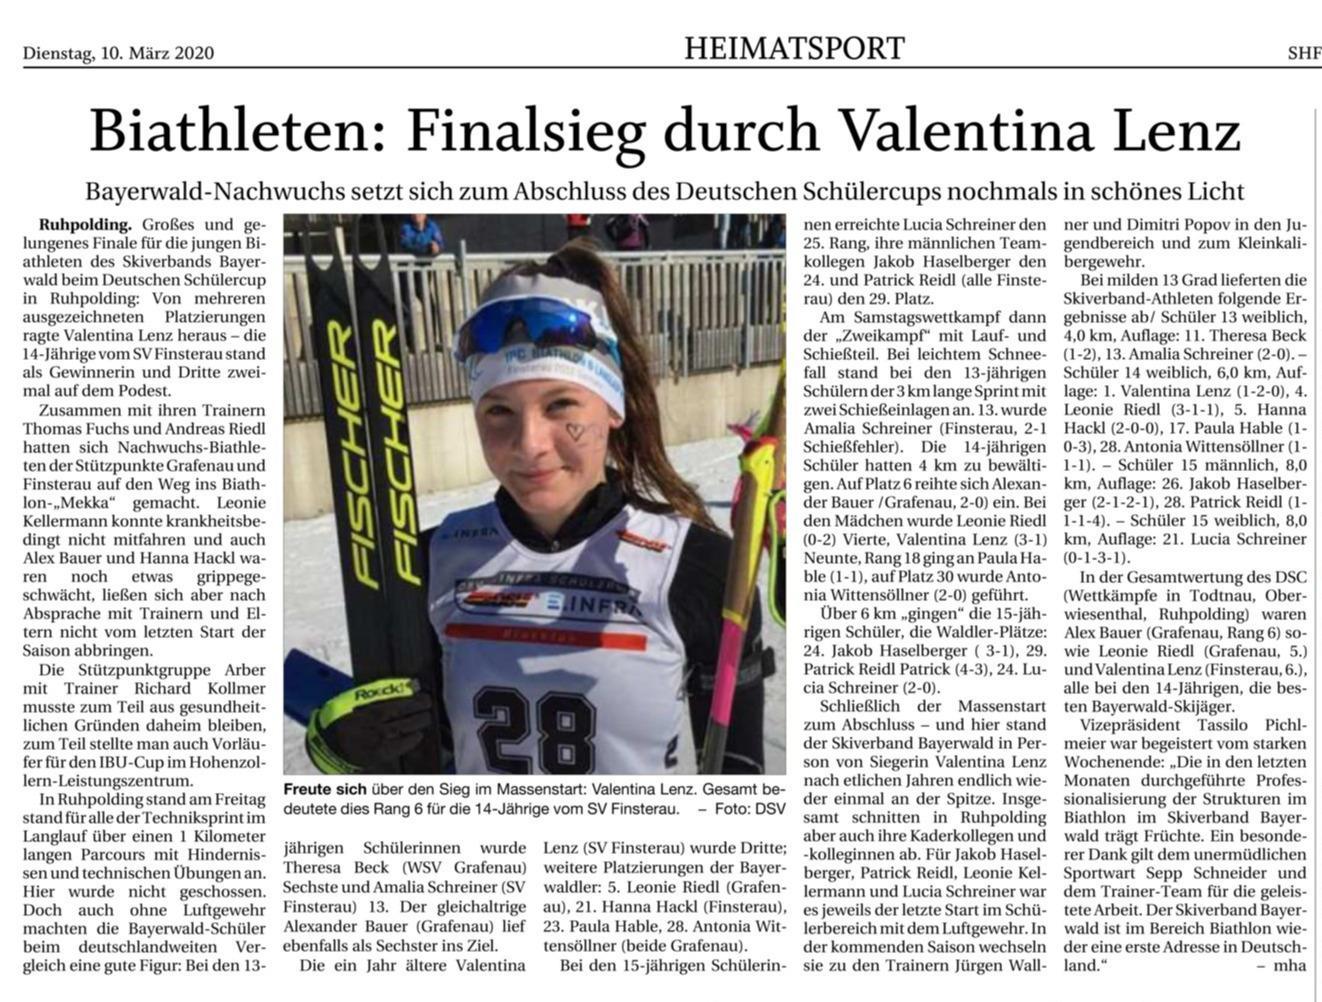 Biathlon: Finalsieg durch Valentina Lenz